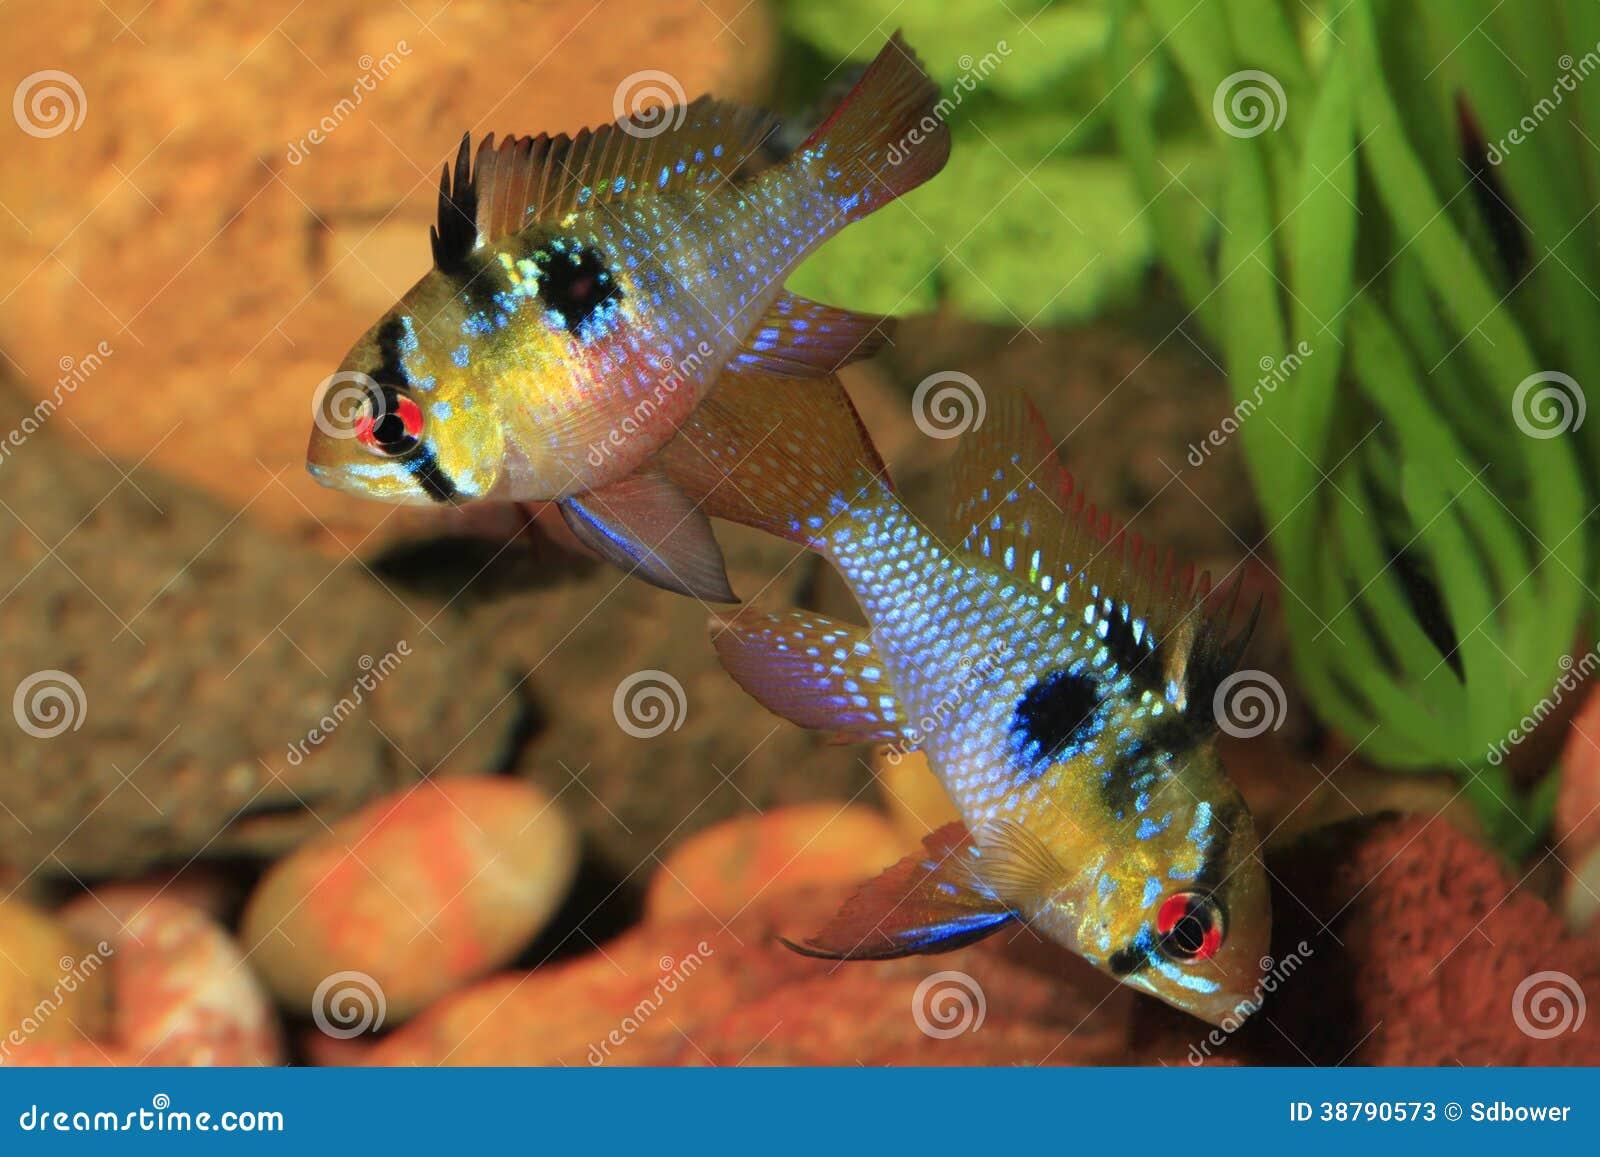 Pair Of German Ram Tropical Fish In Breeding Color Stock